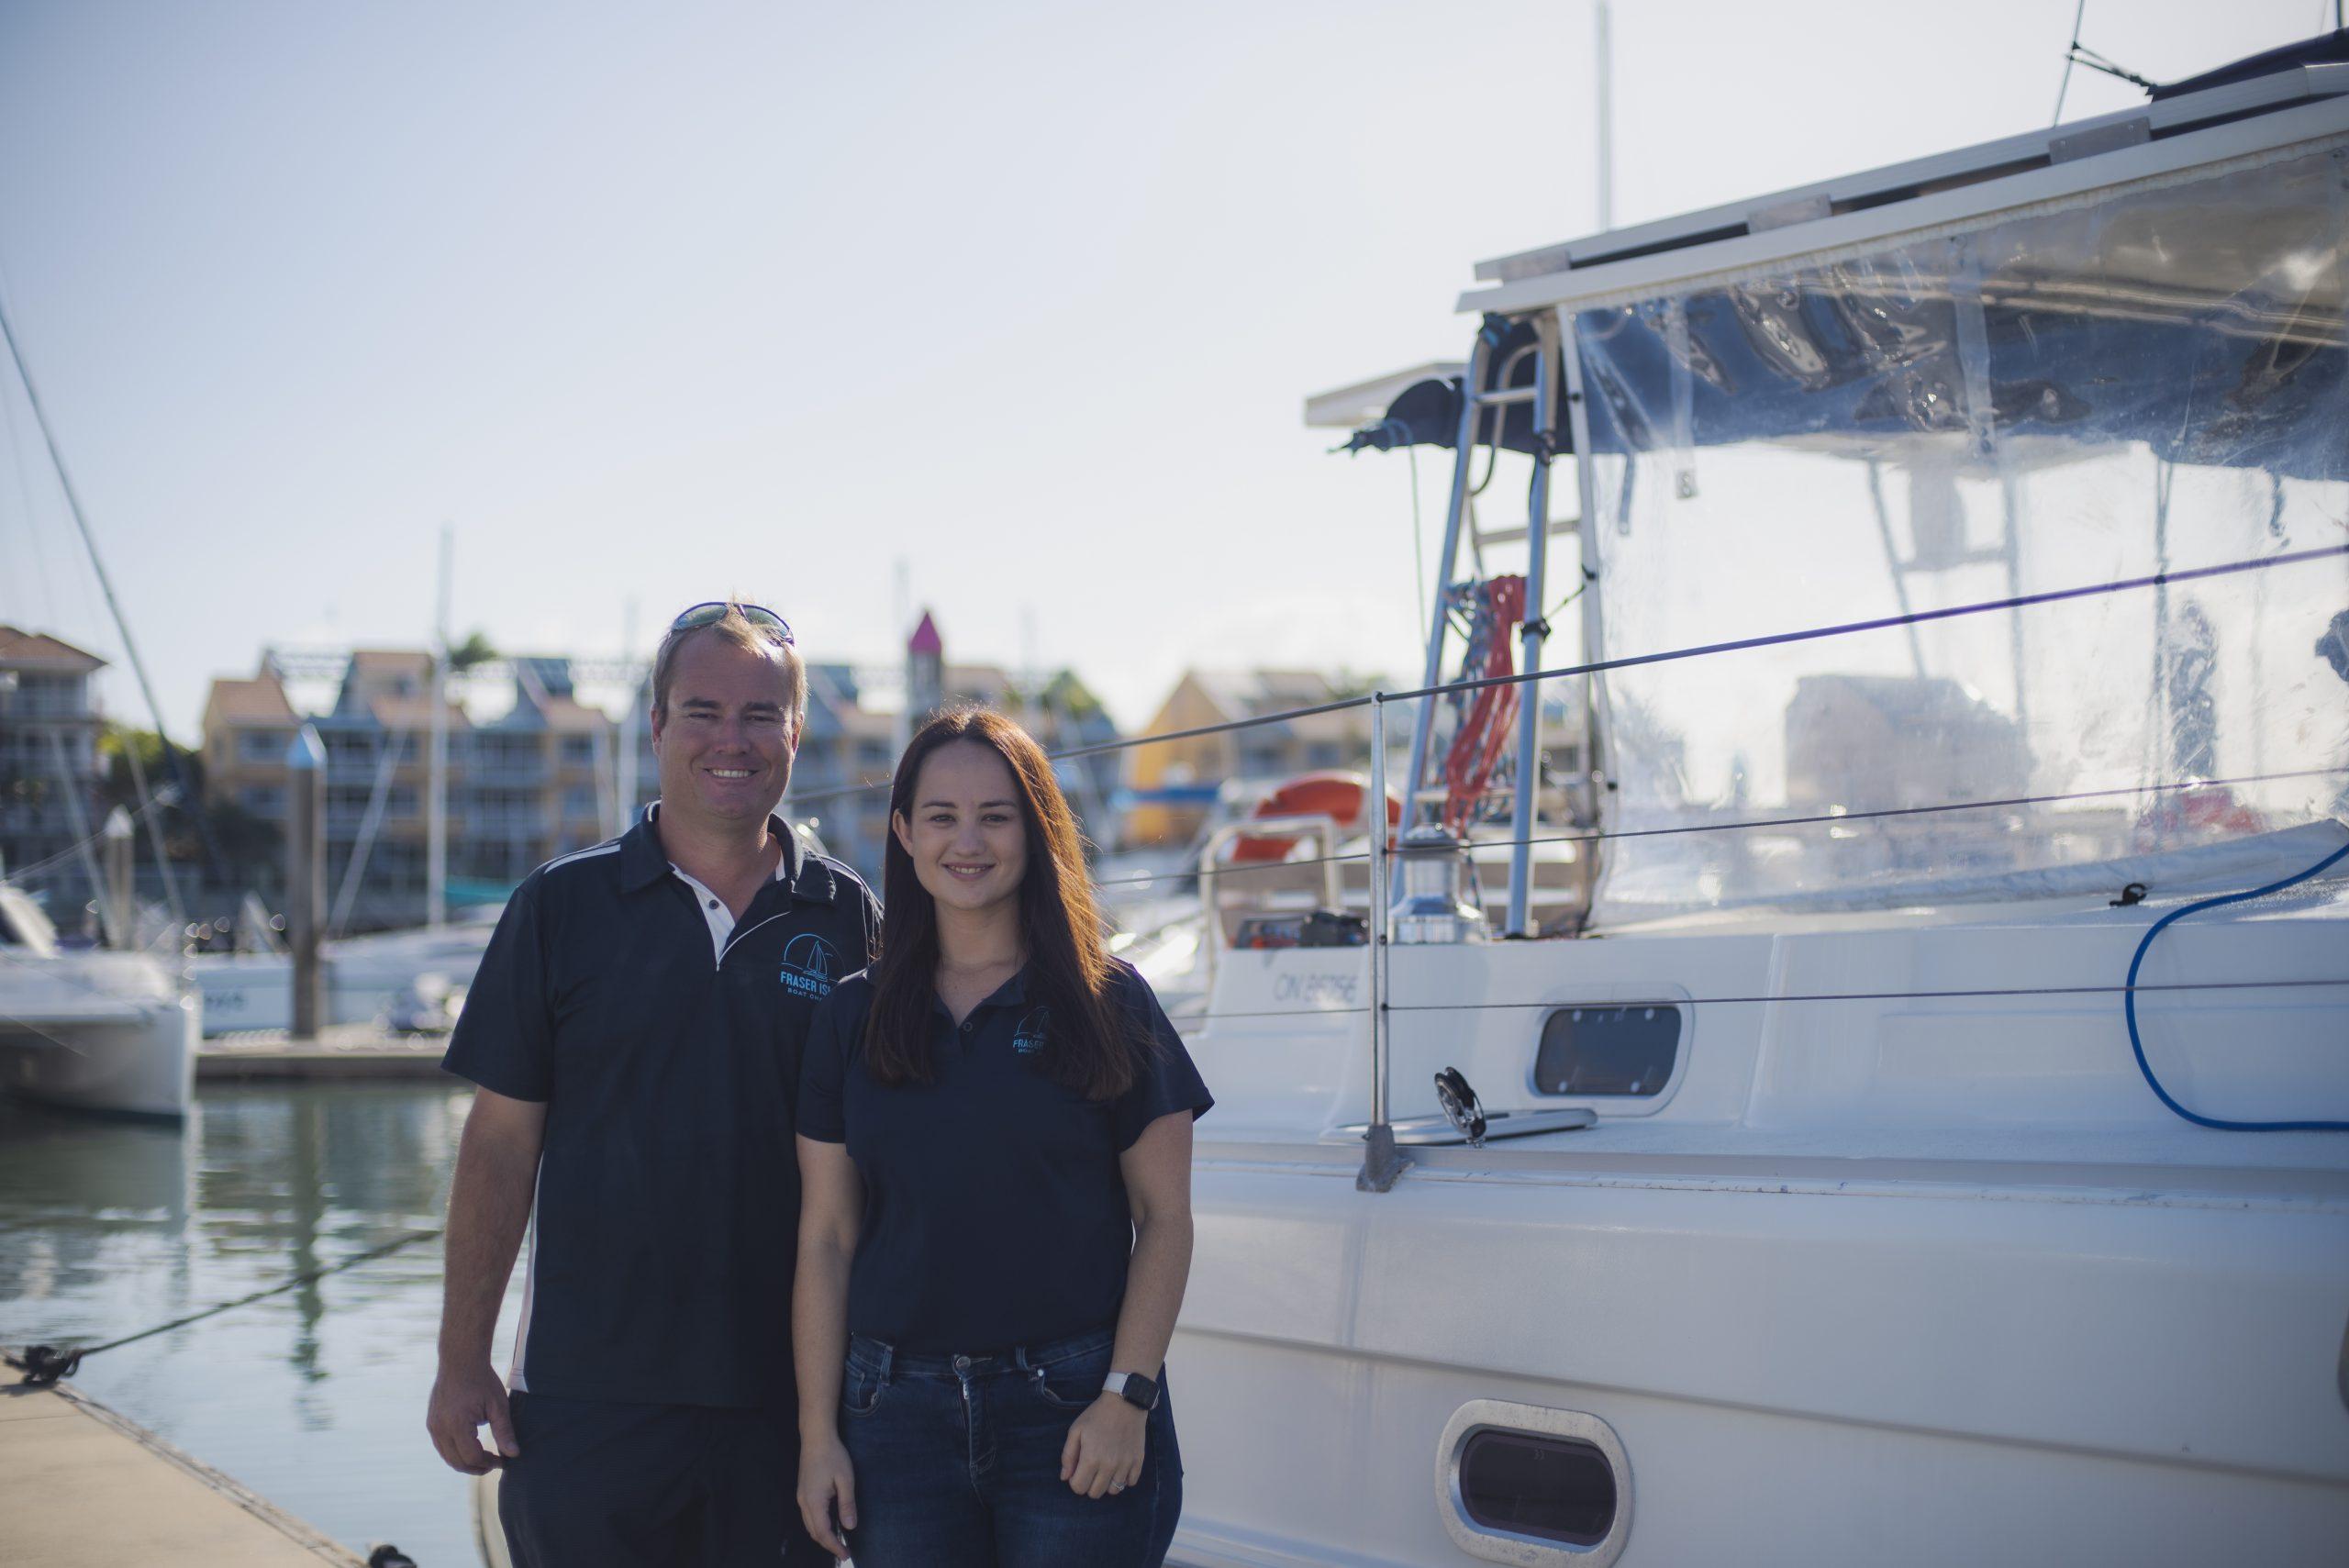 Steph & Scott - Fraser Island Boat Charters